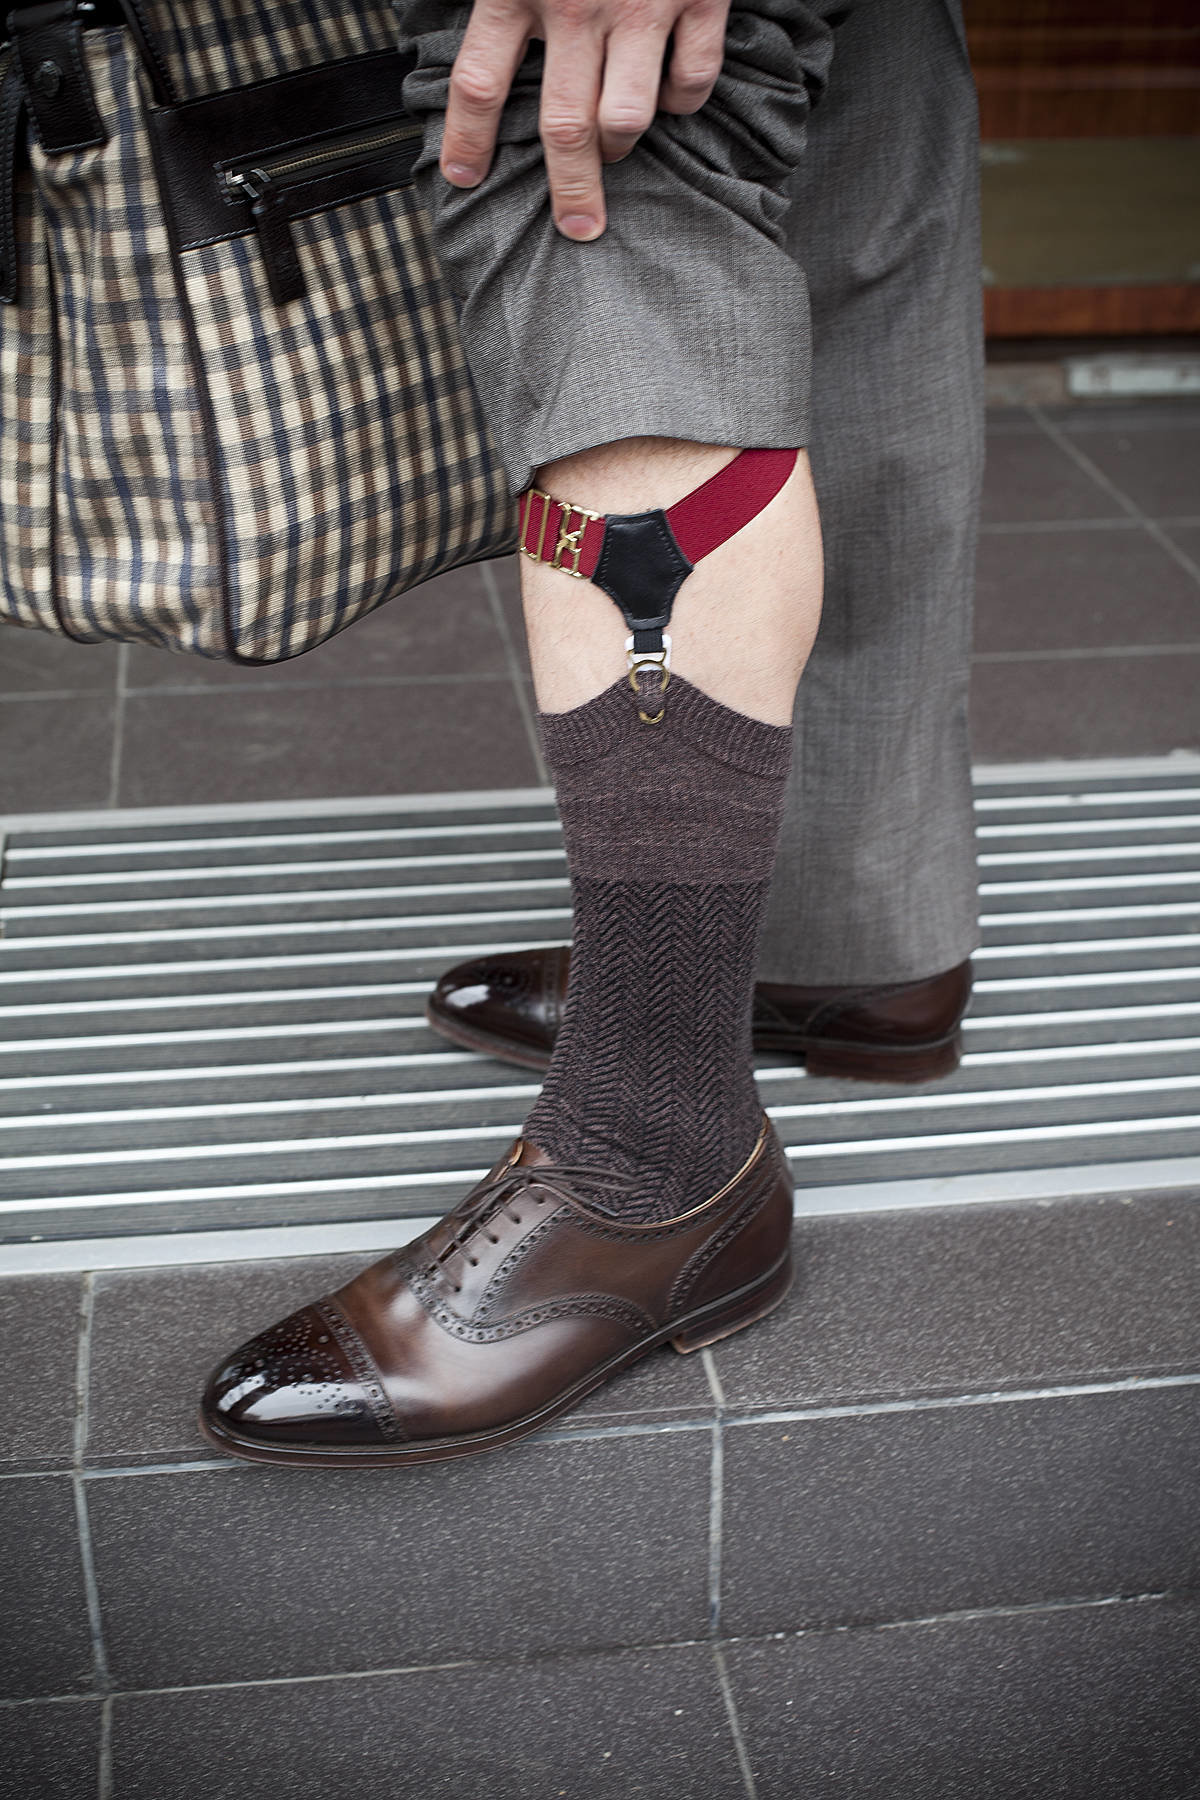 картинки про мужские носки надетые для публикации сми